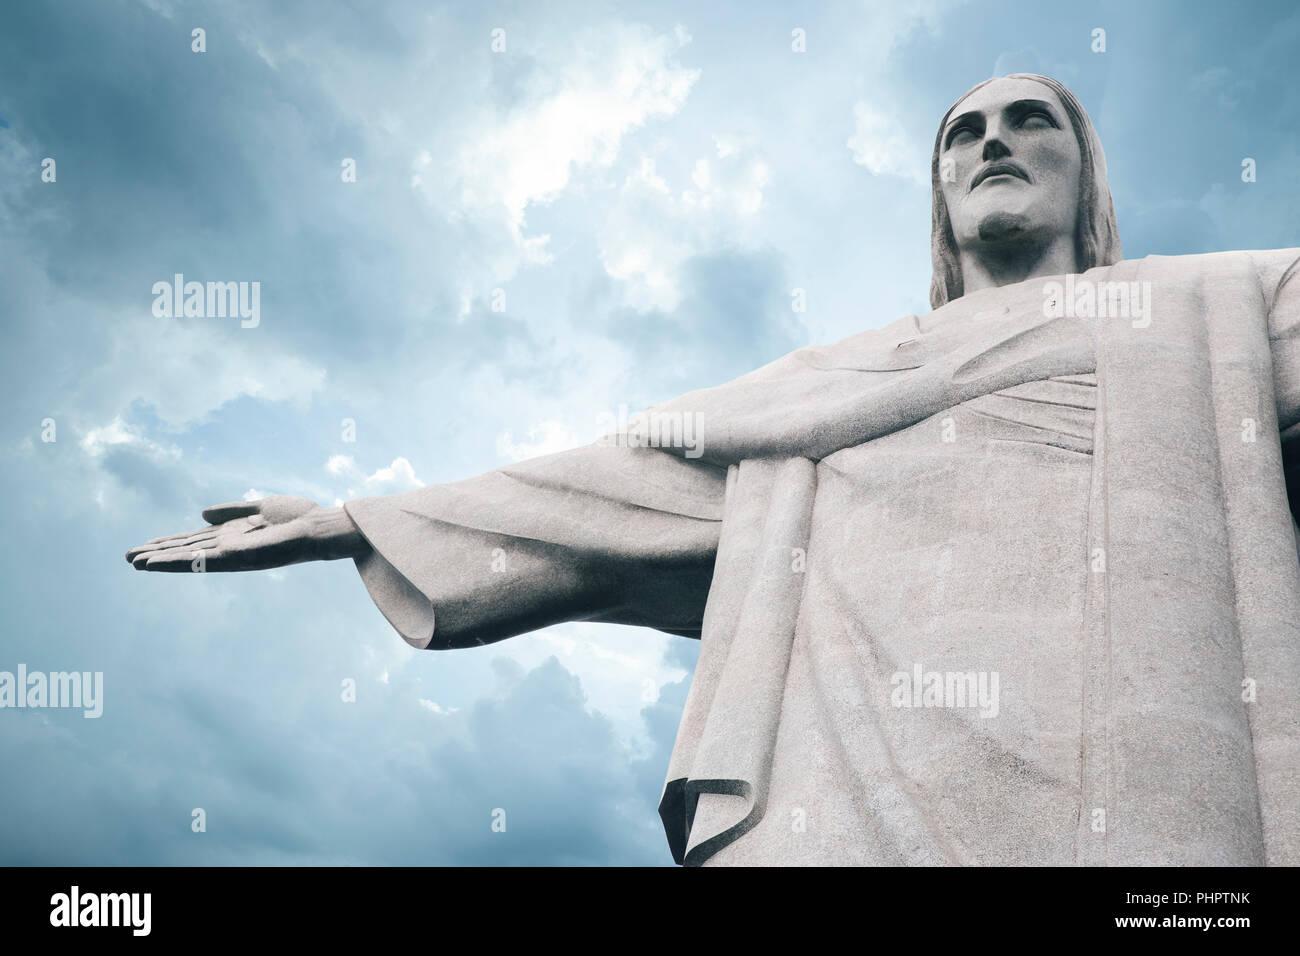 Christ the Redeemer (Cristo Redentor) statue in Rio de Janeiro, Brazil Stock Photo